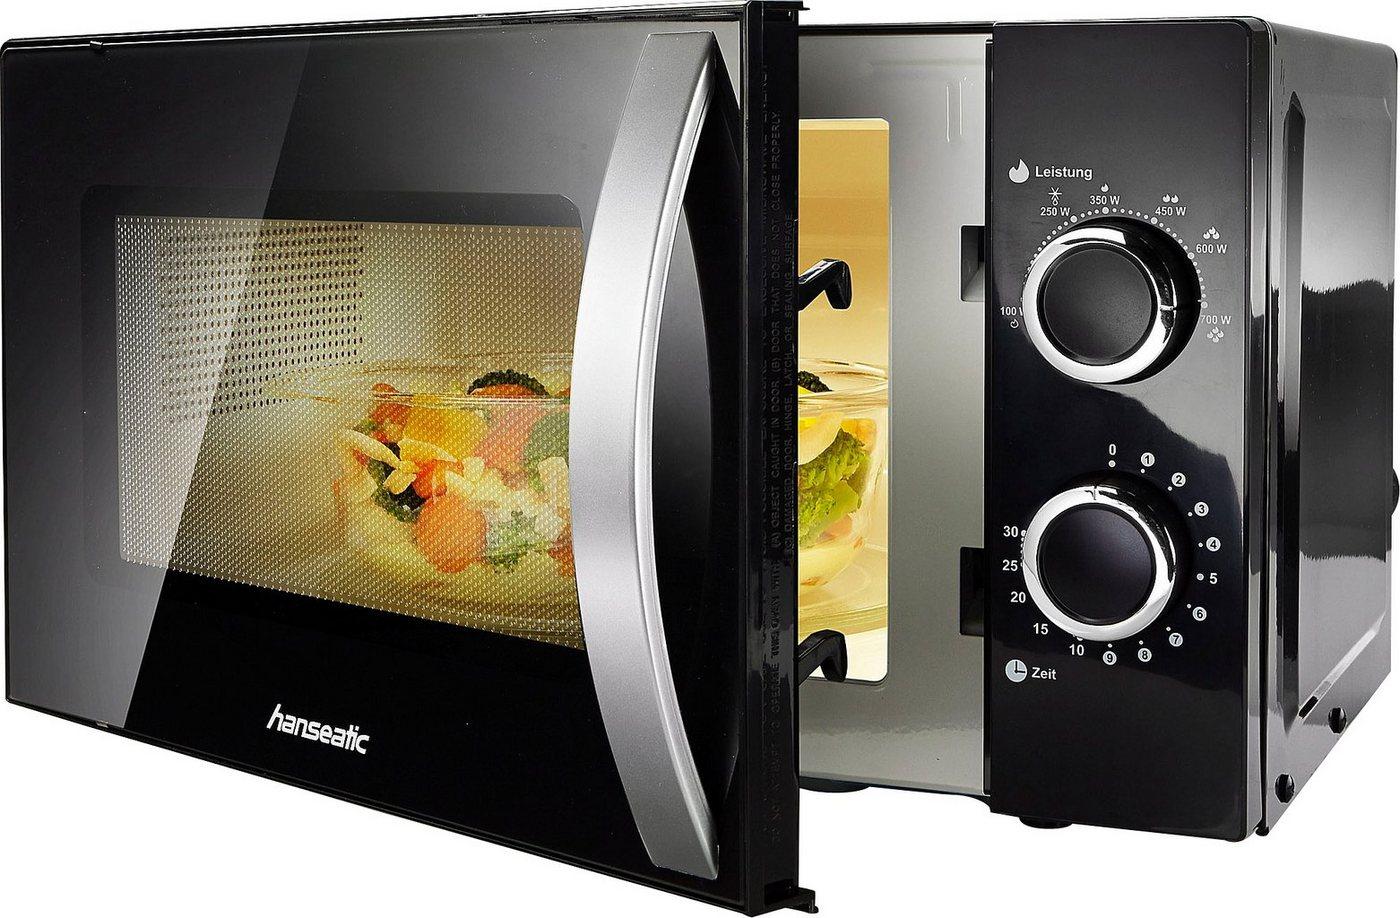 *Hanseatic Mikrowelle SMH207P3H-P schwarz, 700 W, Auftaufunktion*